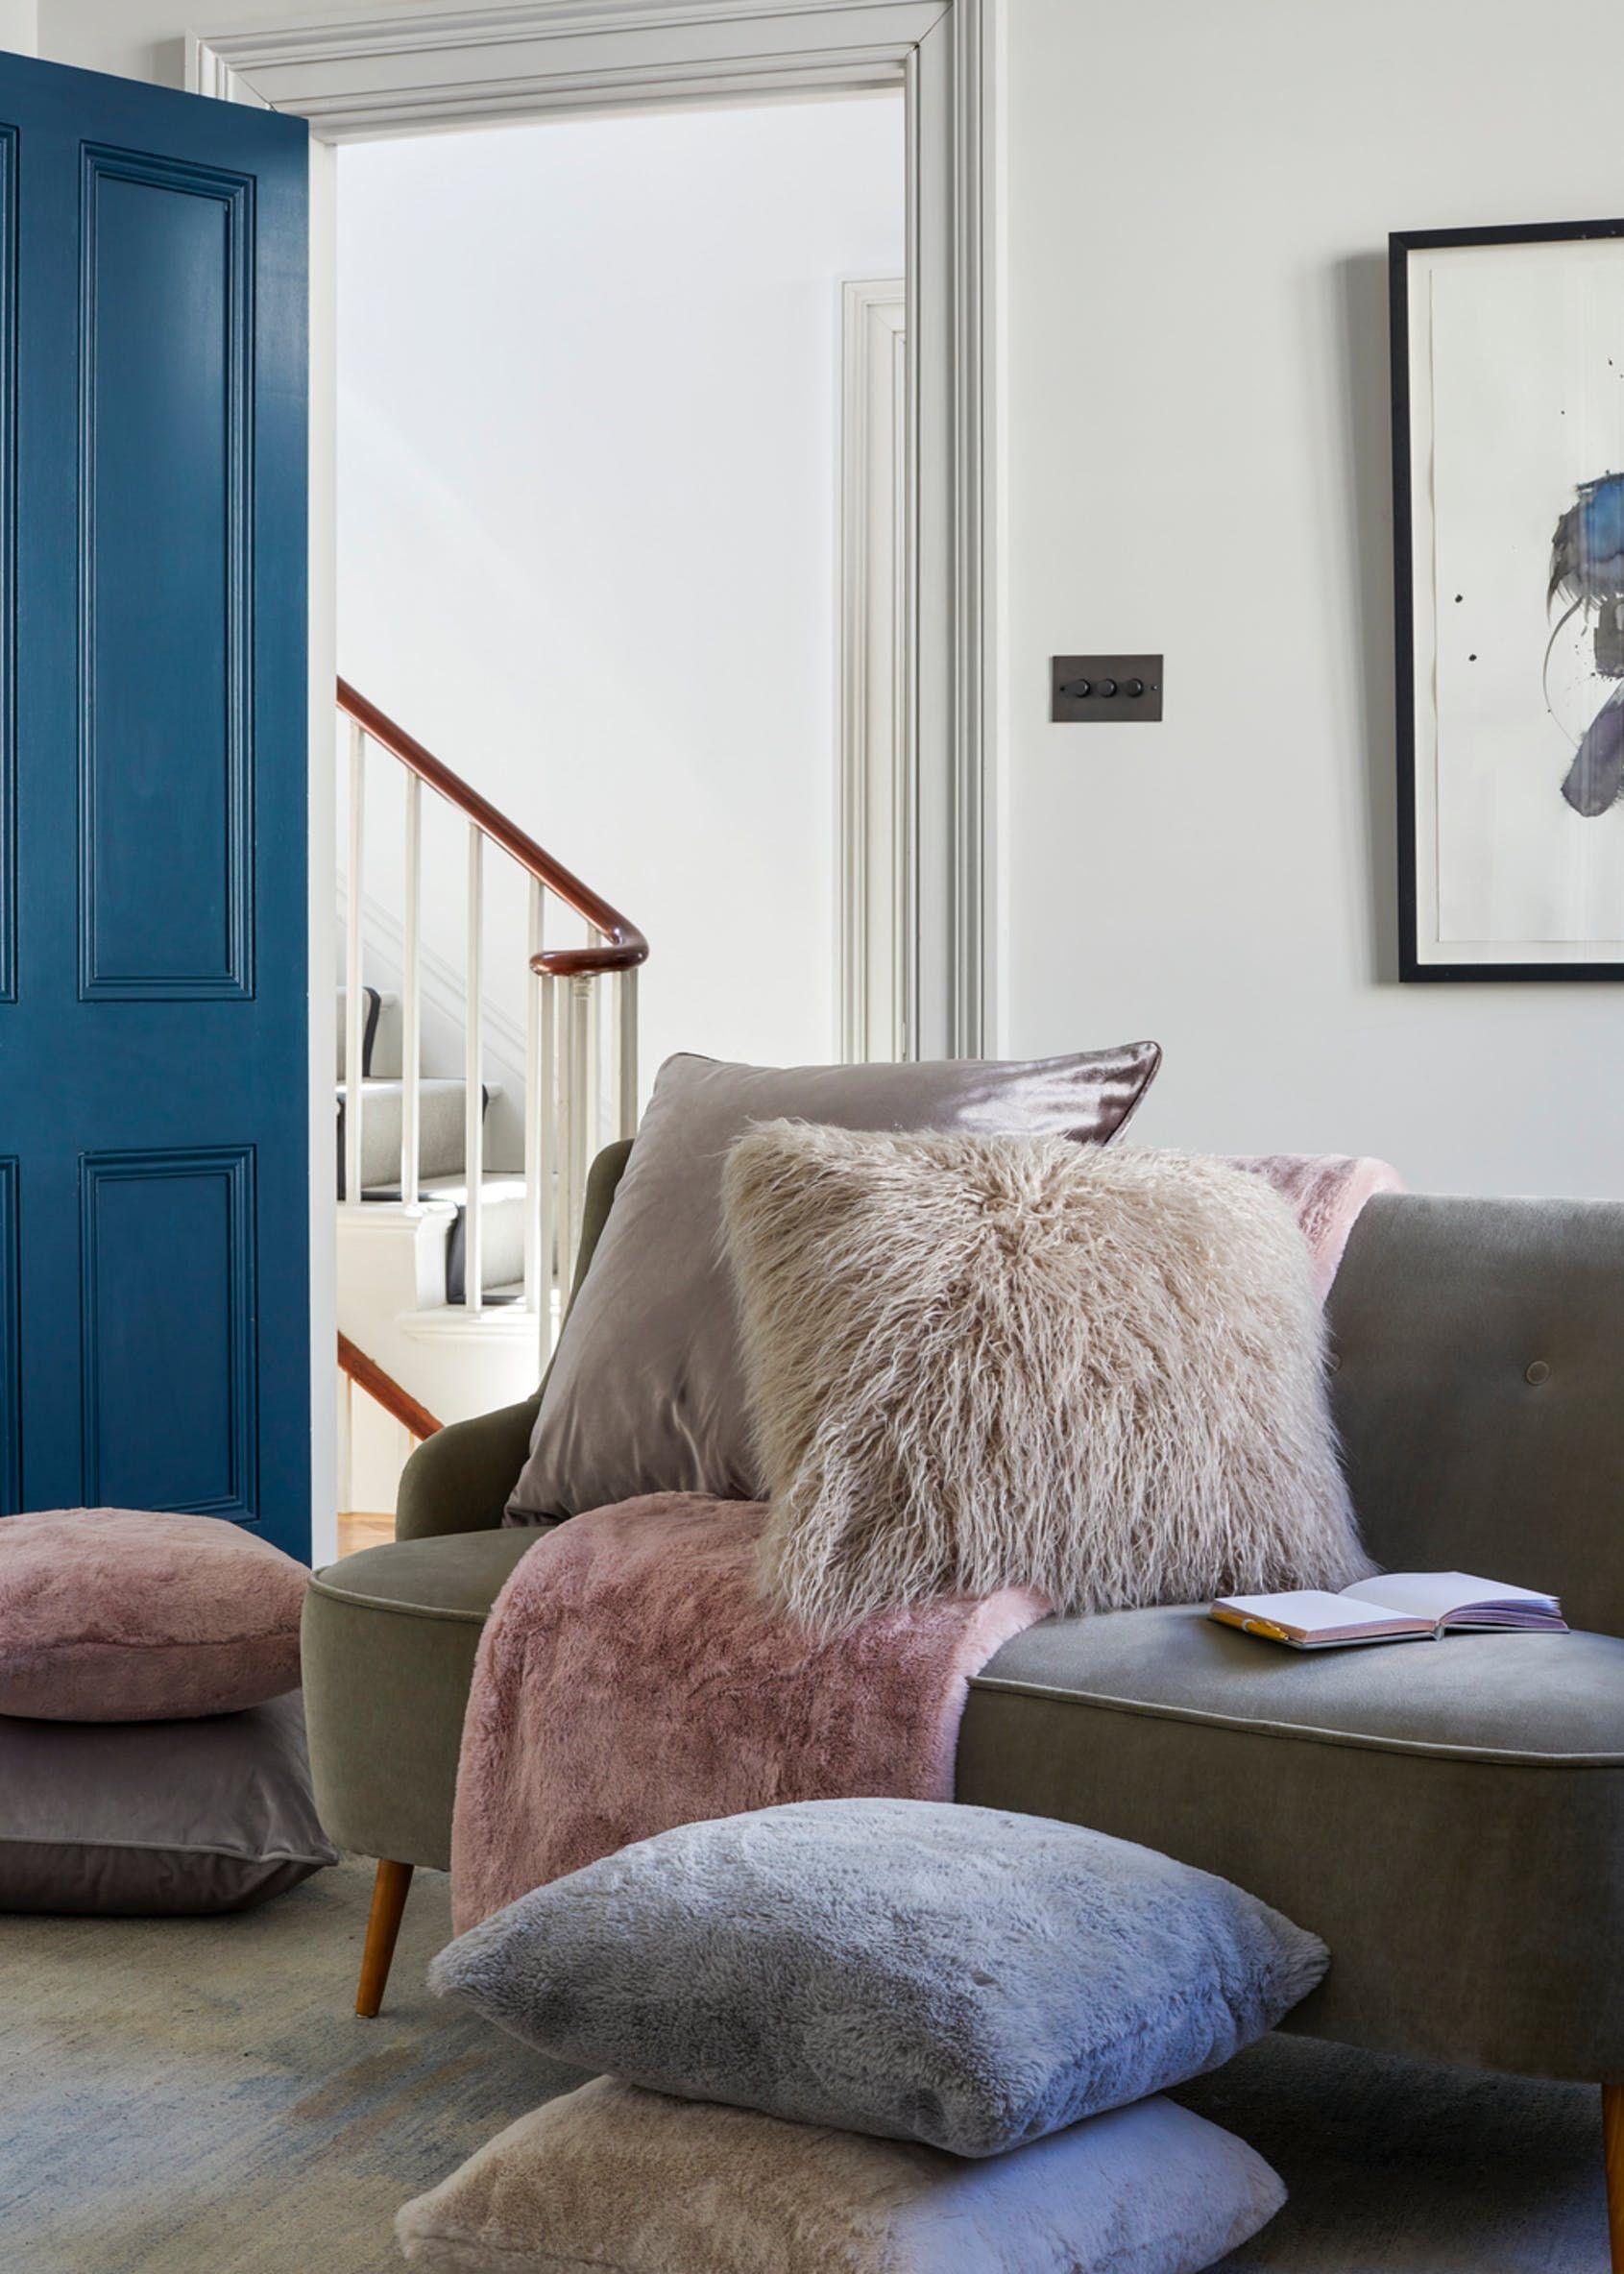 Faux Fur Throw (150cm x 130cm) Cushions on sofa, Cosy